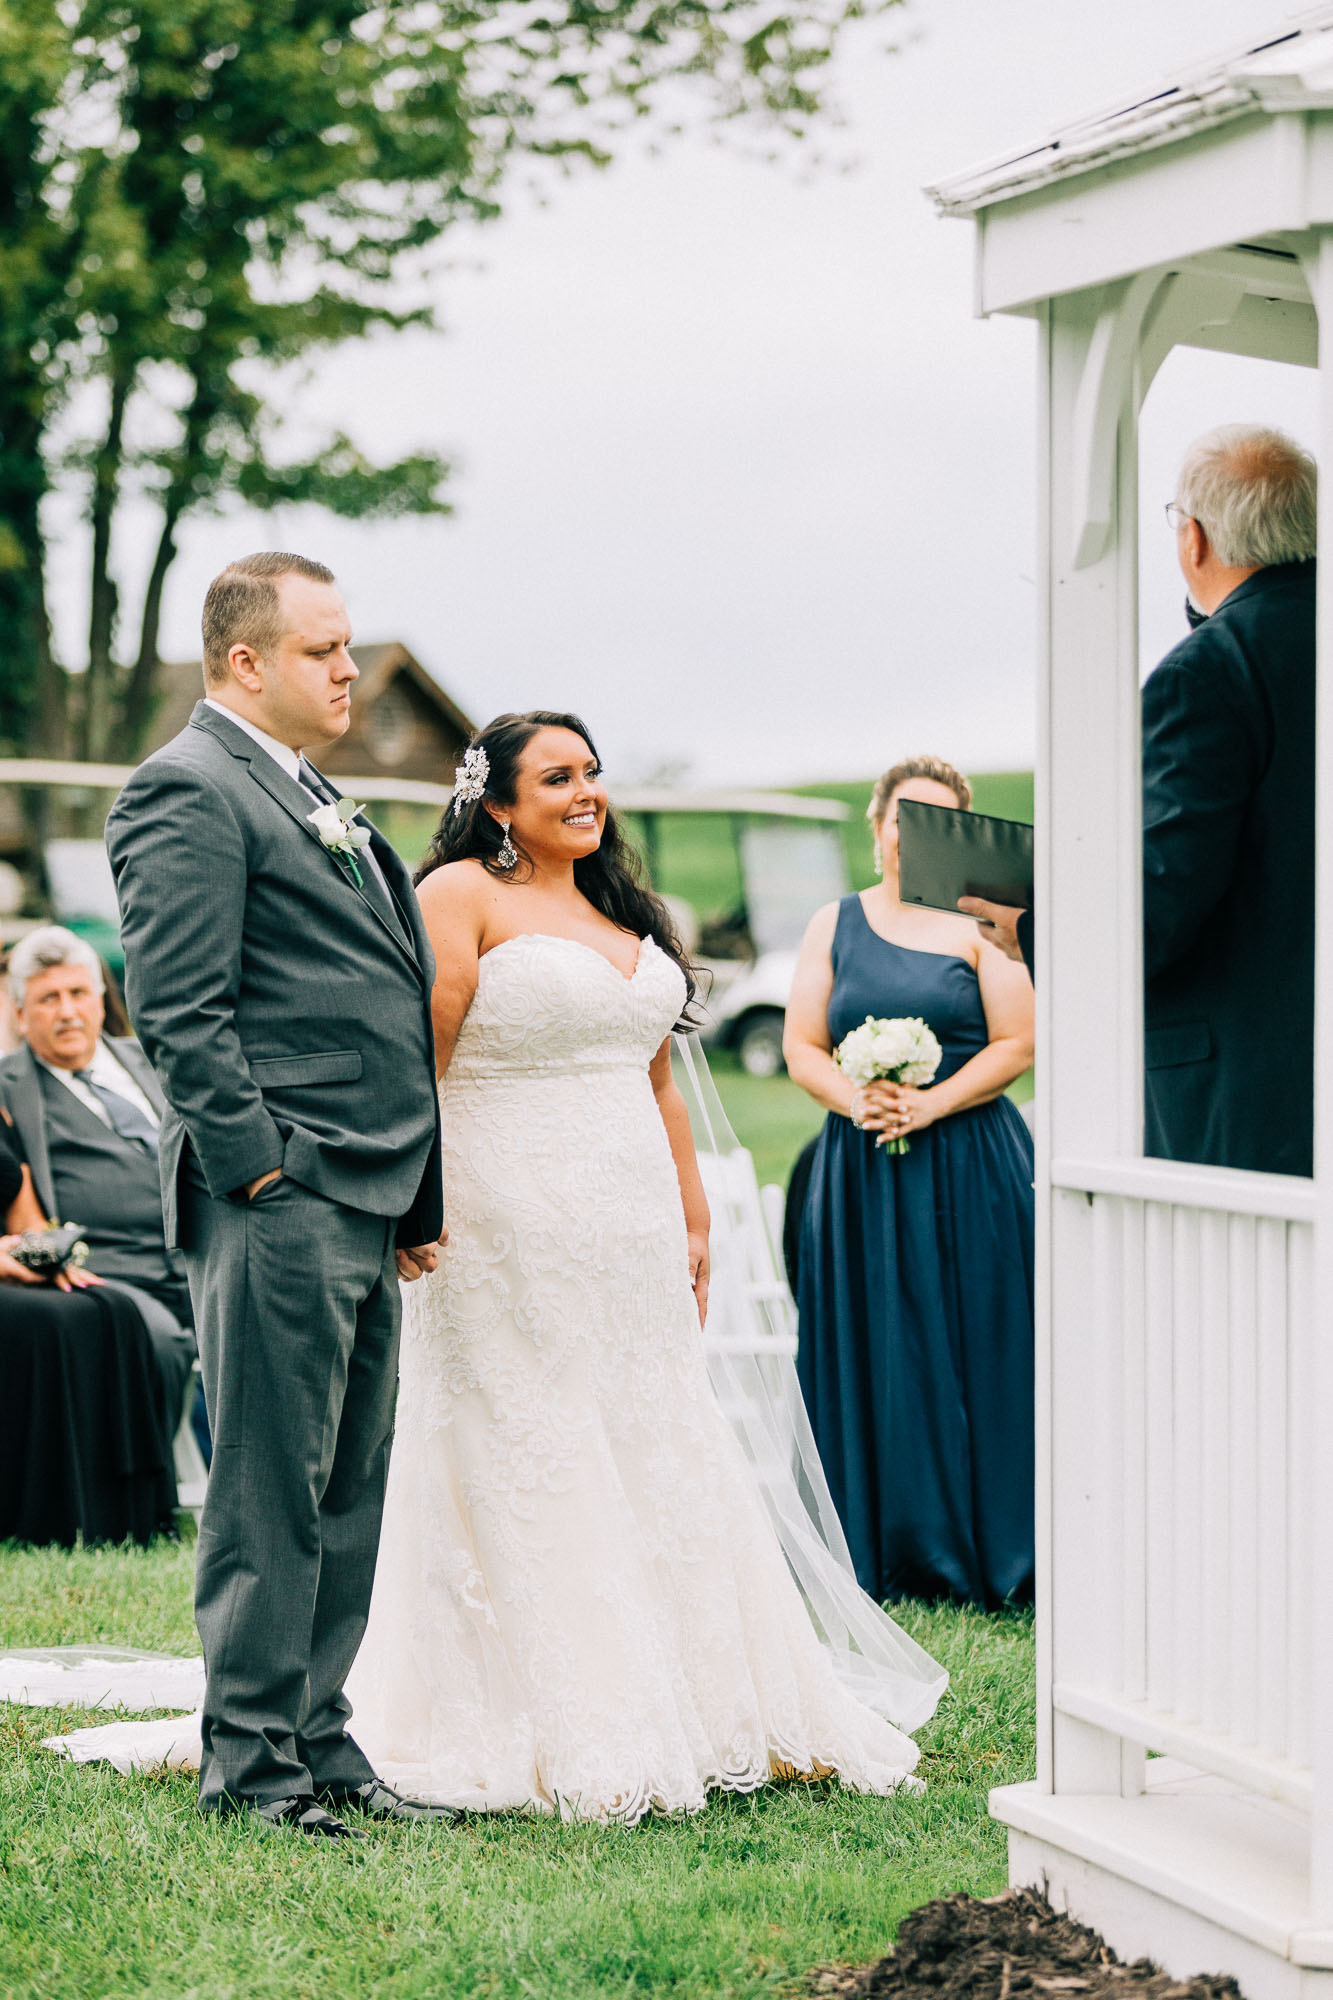 stonhedge-country-club-wedding-8294.jpg